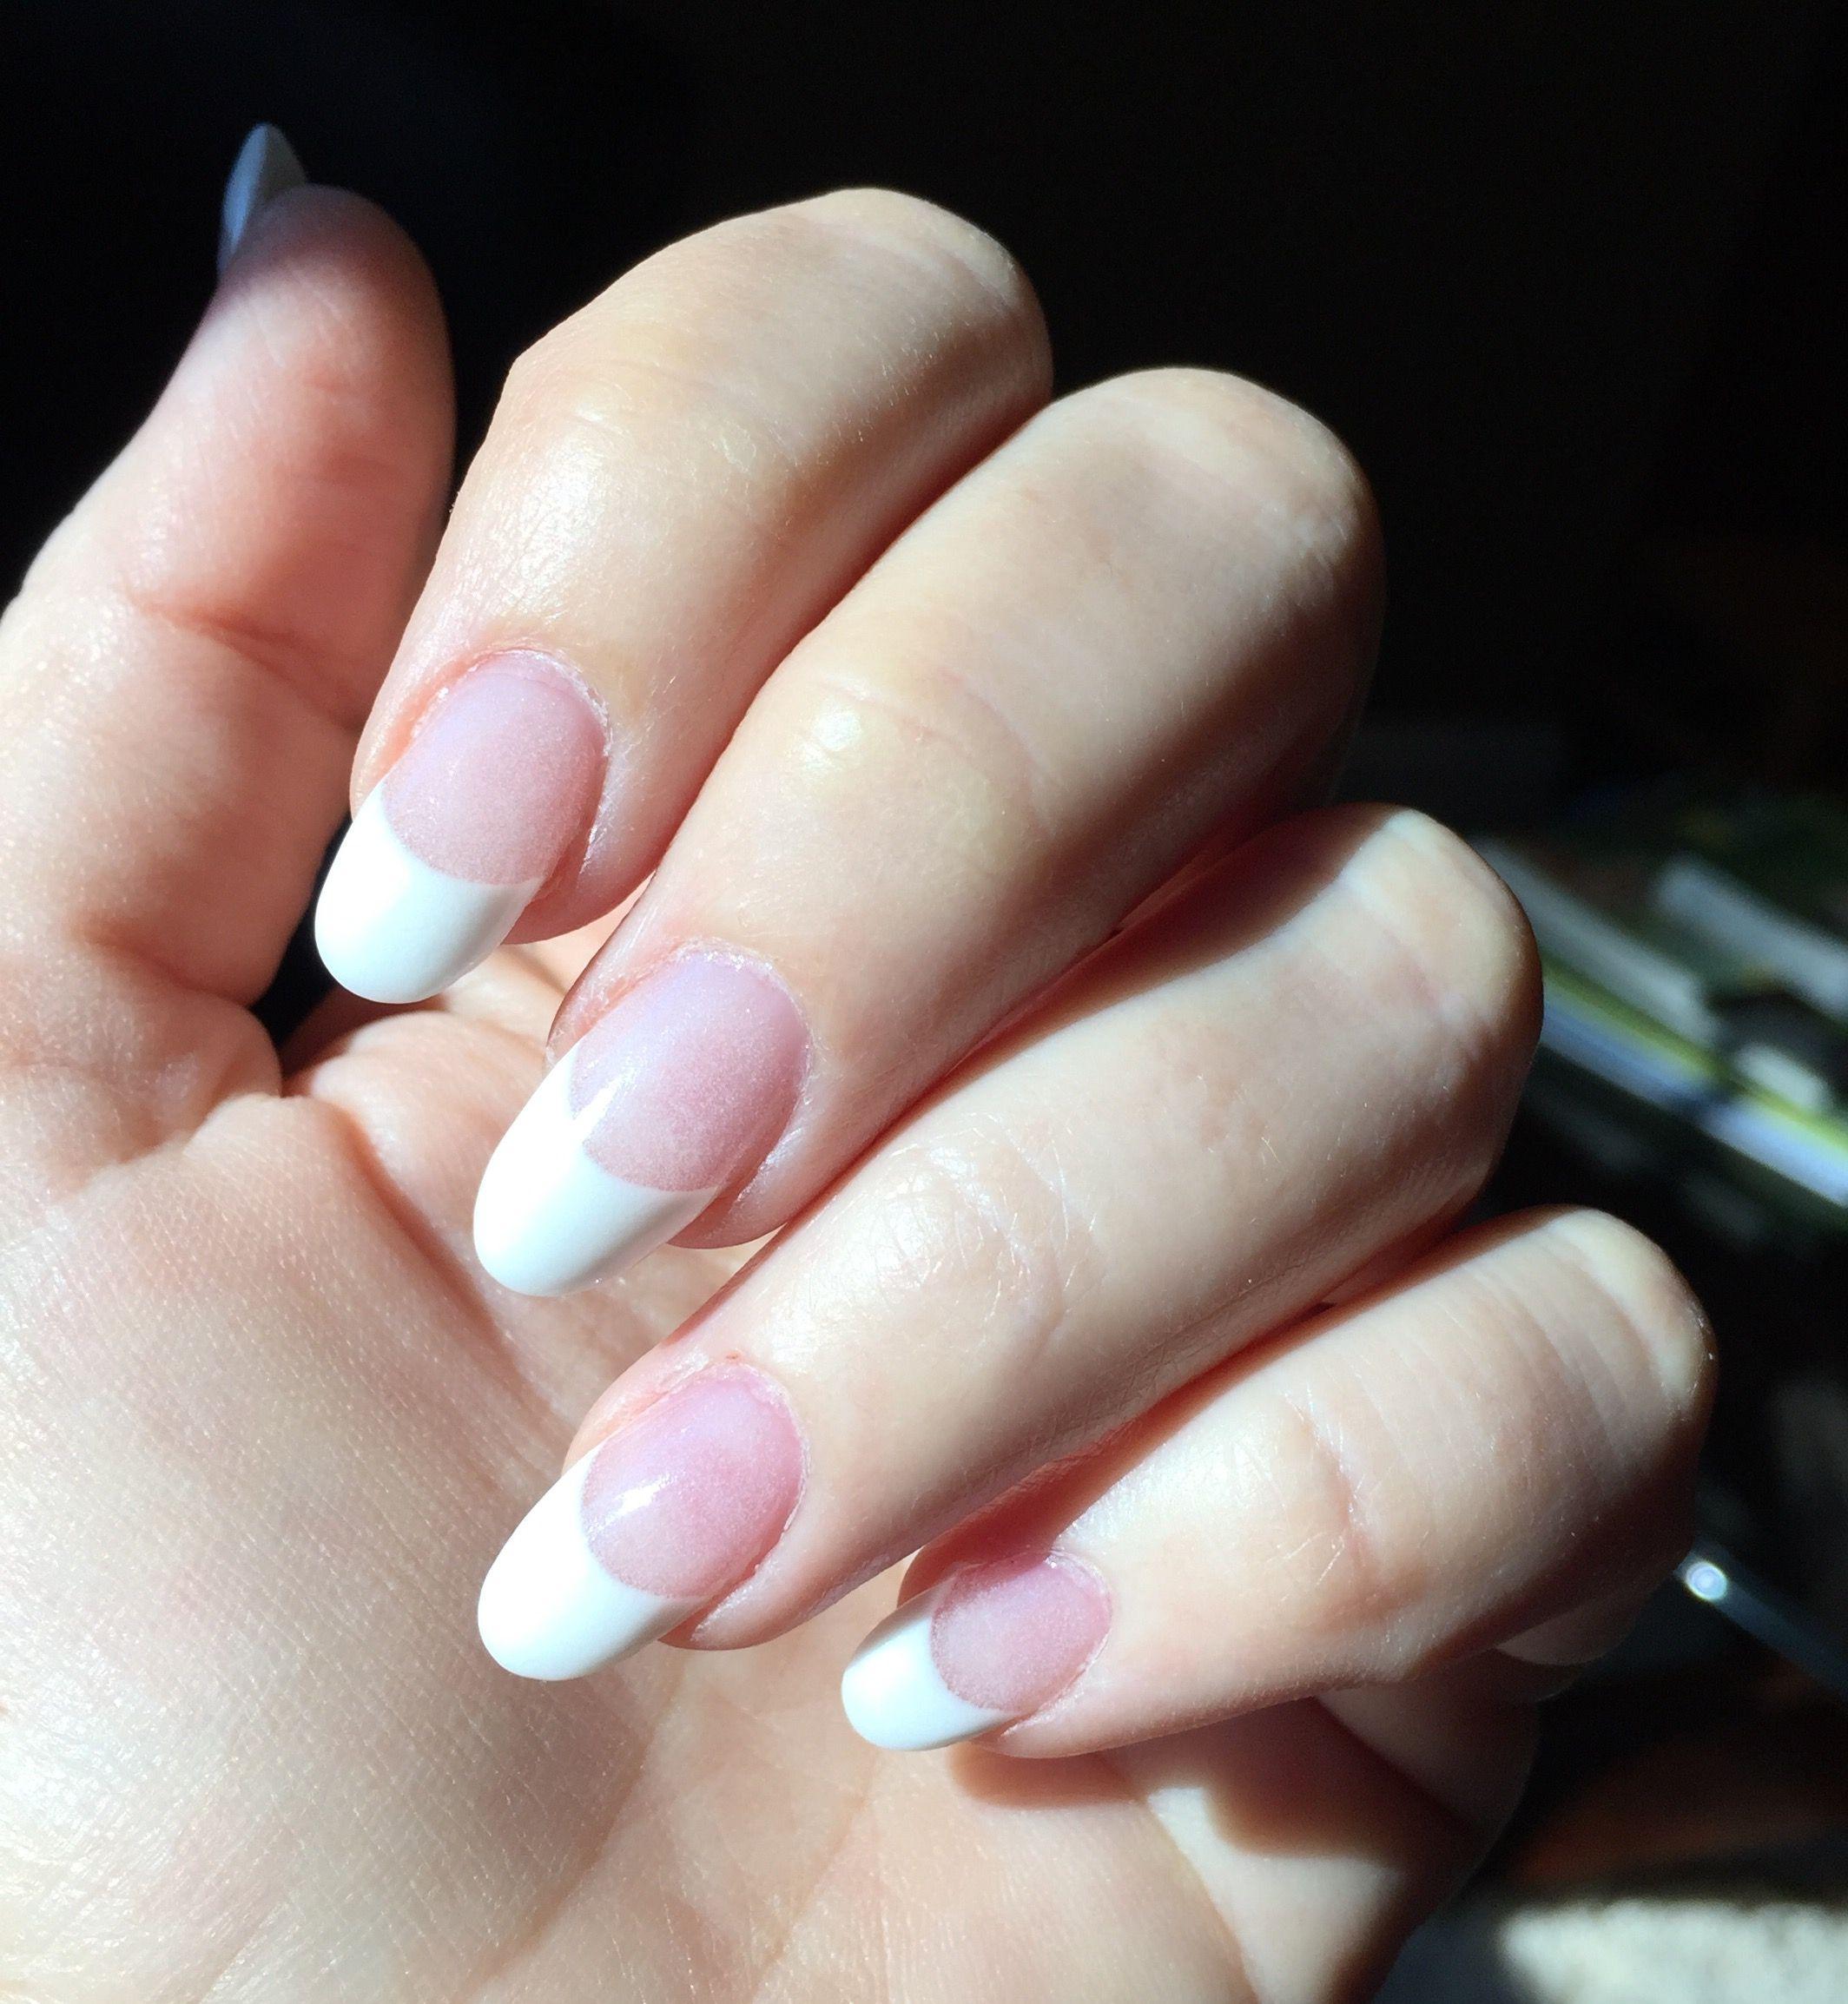 Angela\'s June SNS pink and white nails, light natural pink   Nails ...